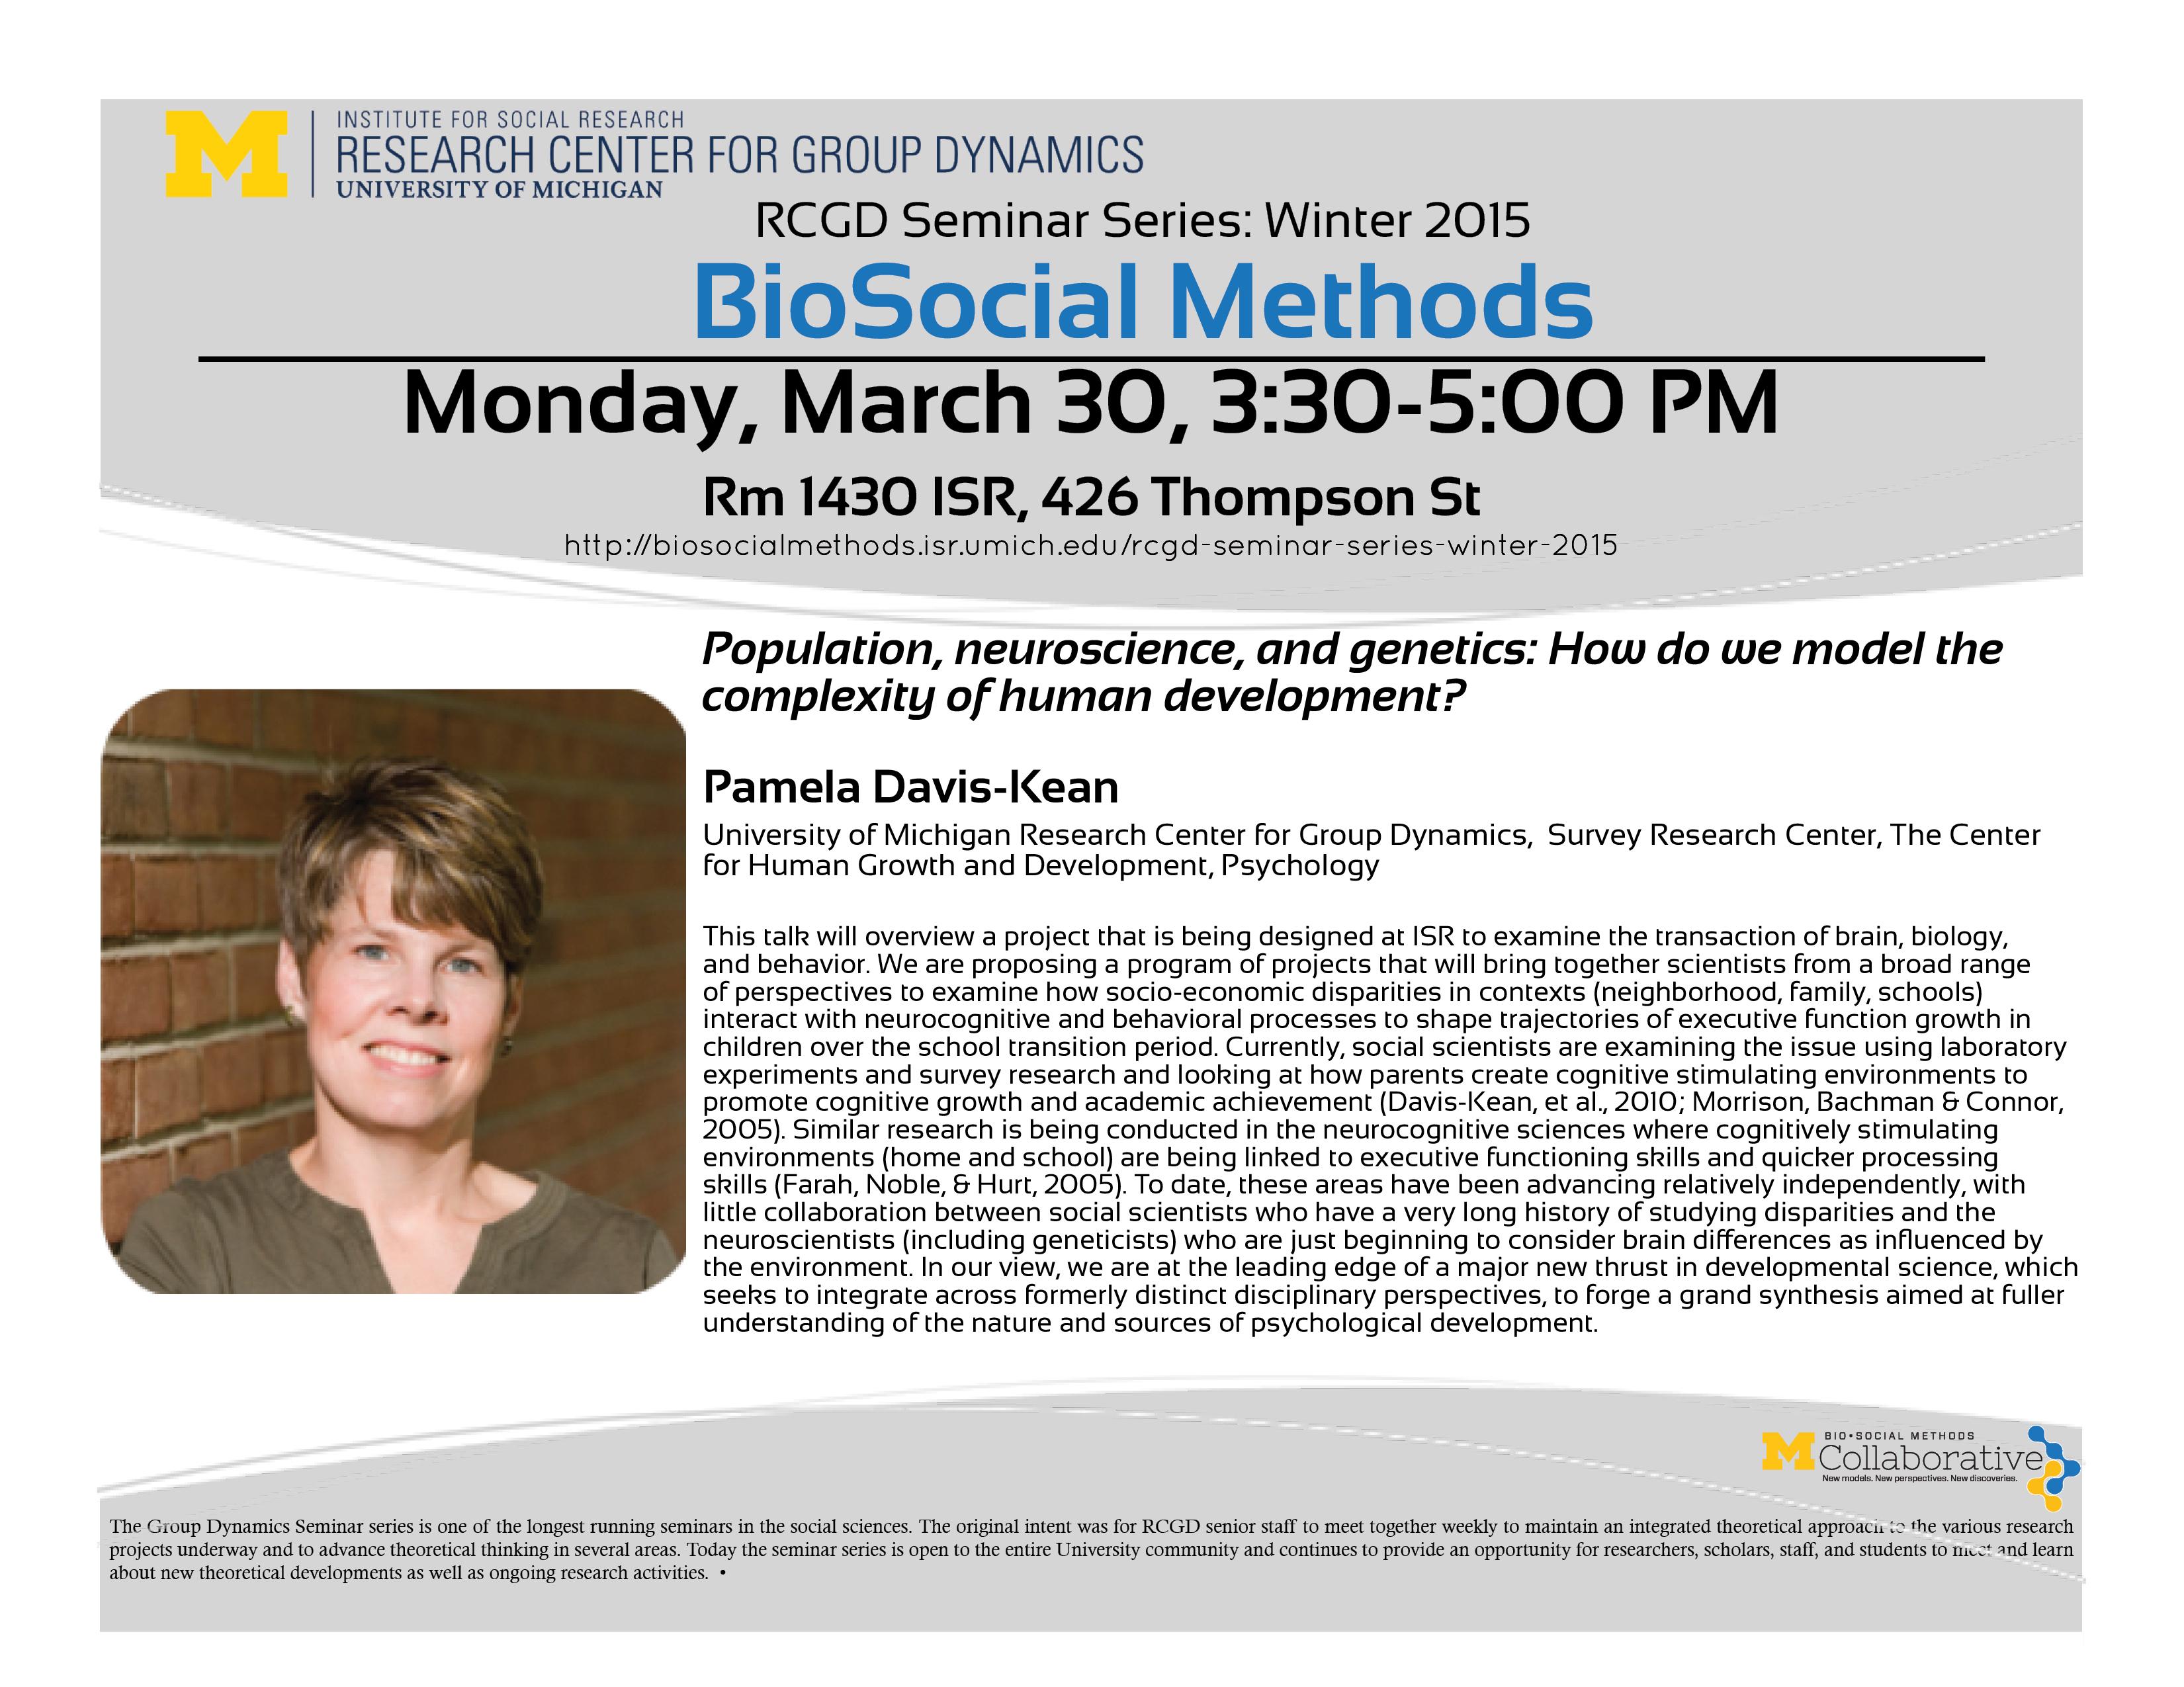 RCGD Seminar_Pam Davis-Kean